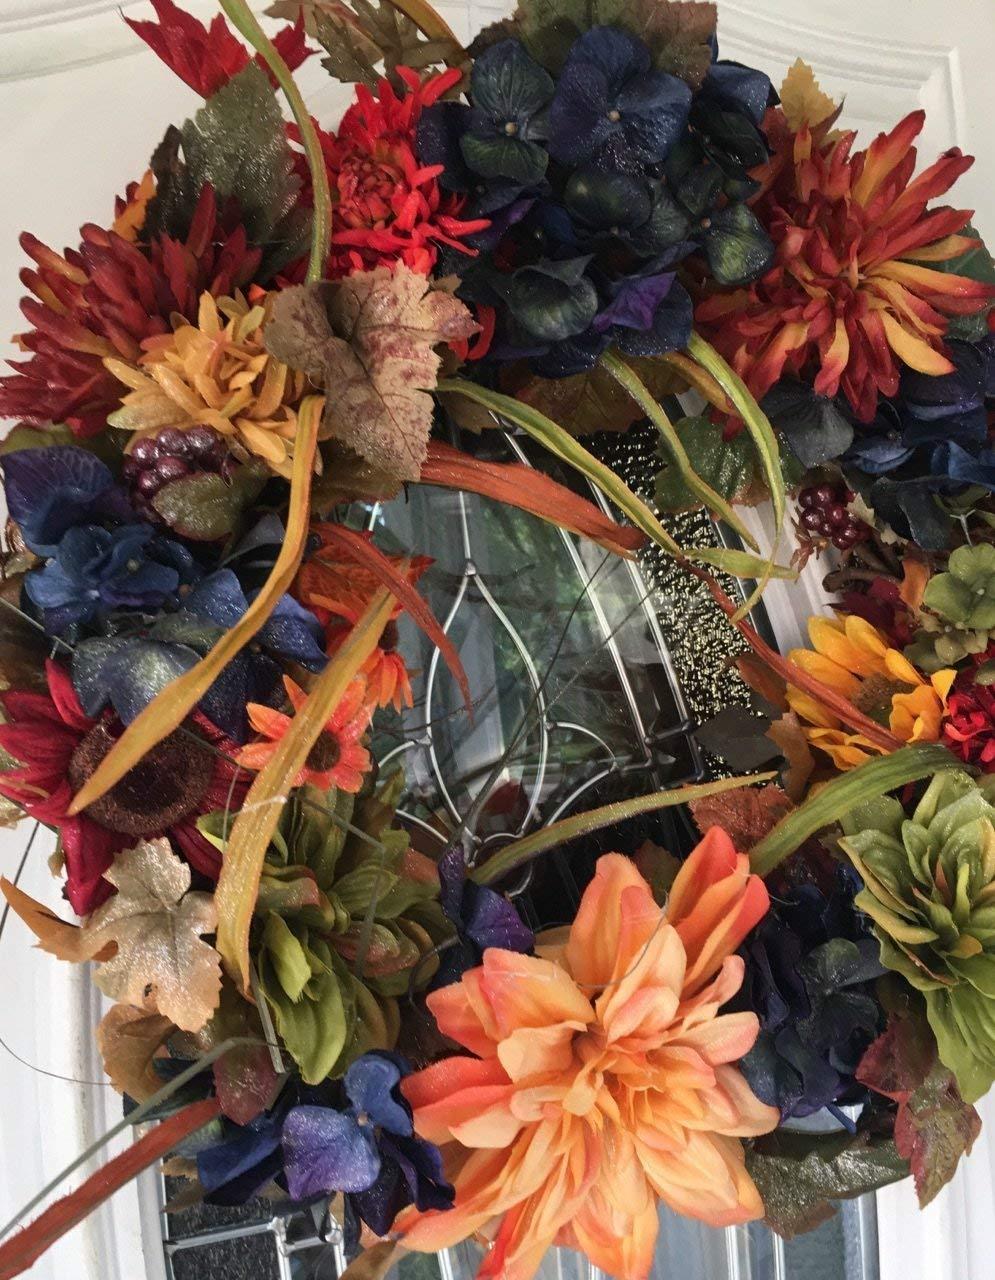 Fall Floral Wreath, Autumn Wreath, Fall Door Wreath, Fall Wreath for Front Door, Floral Wreath, Indoor/Outdoor Wreath,Front Door Wreath, Decorative Wreath